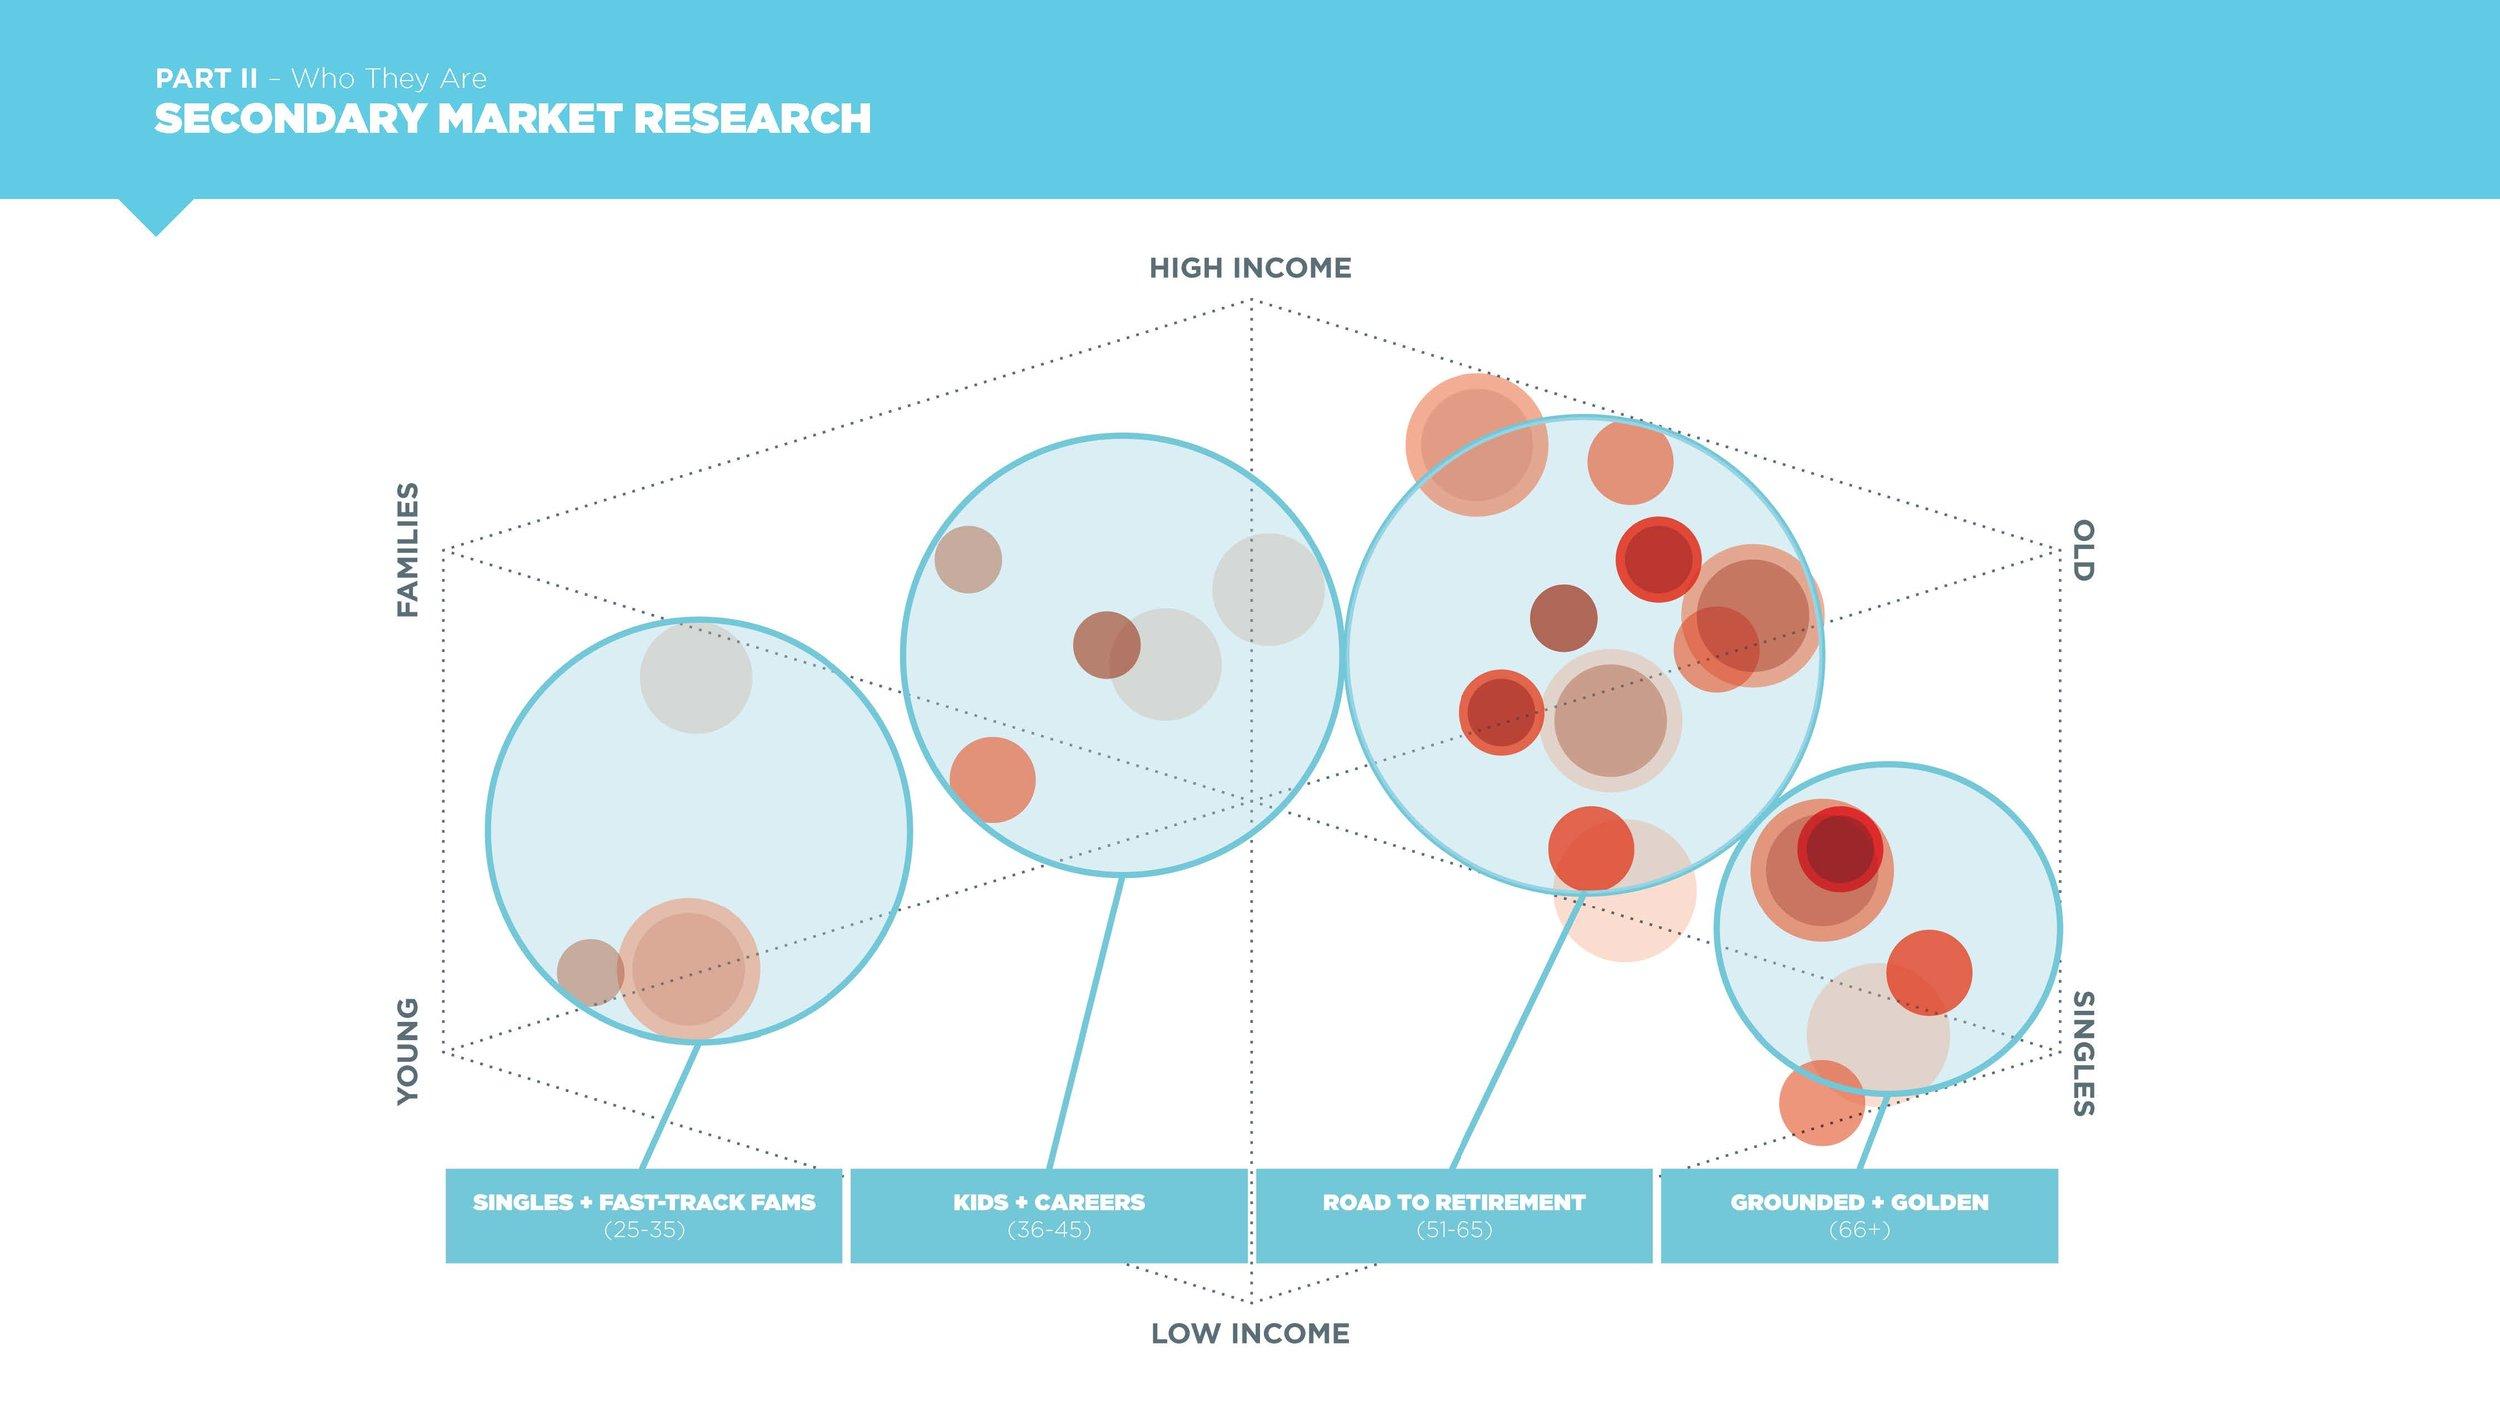 Nazareth_Jun2016_Research_Report_REDACTED_Page_018.jpg